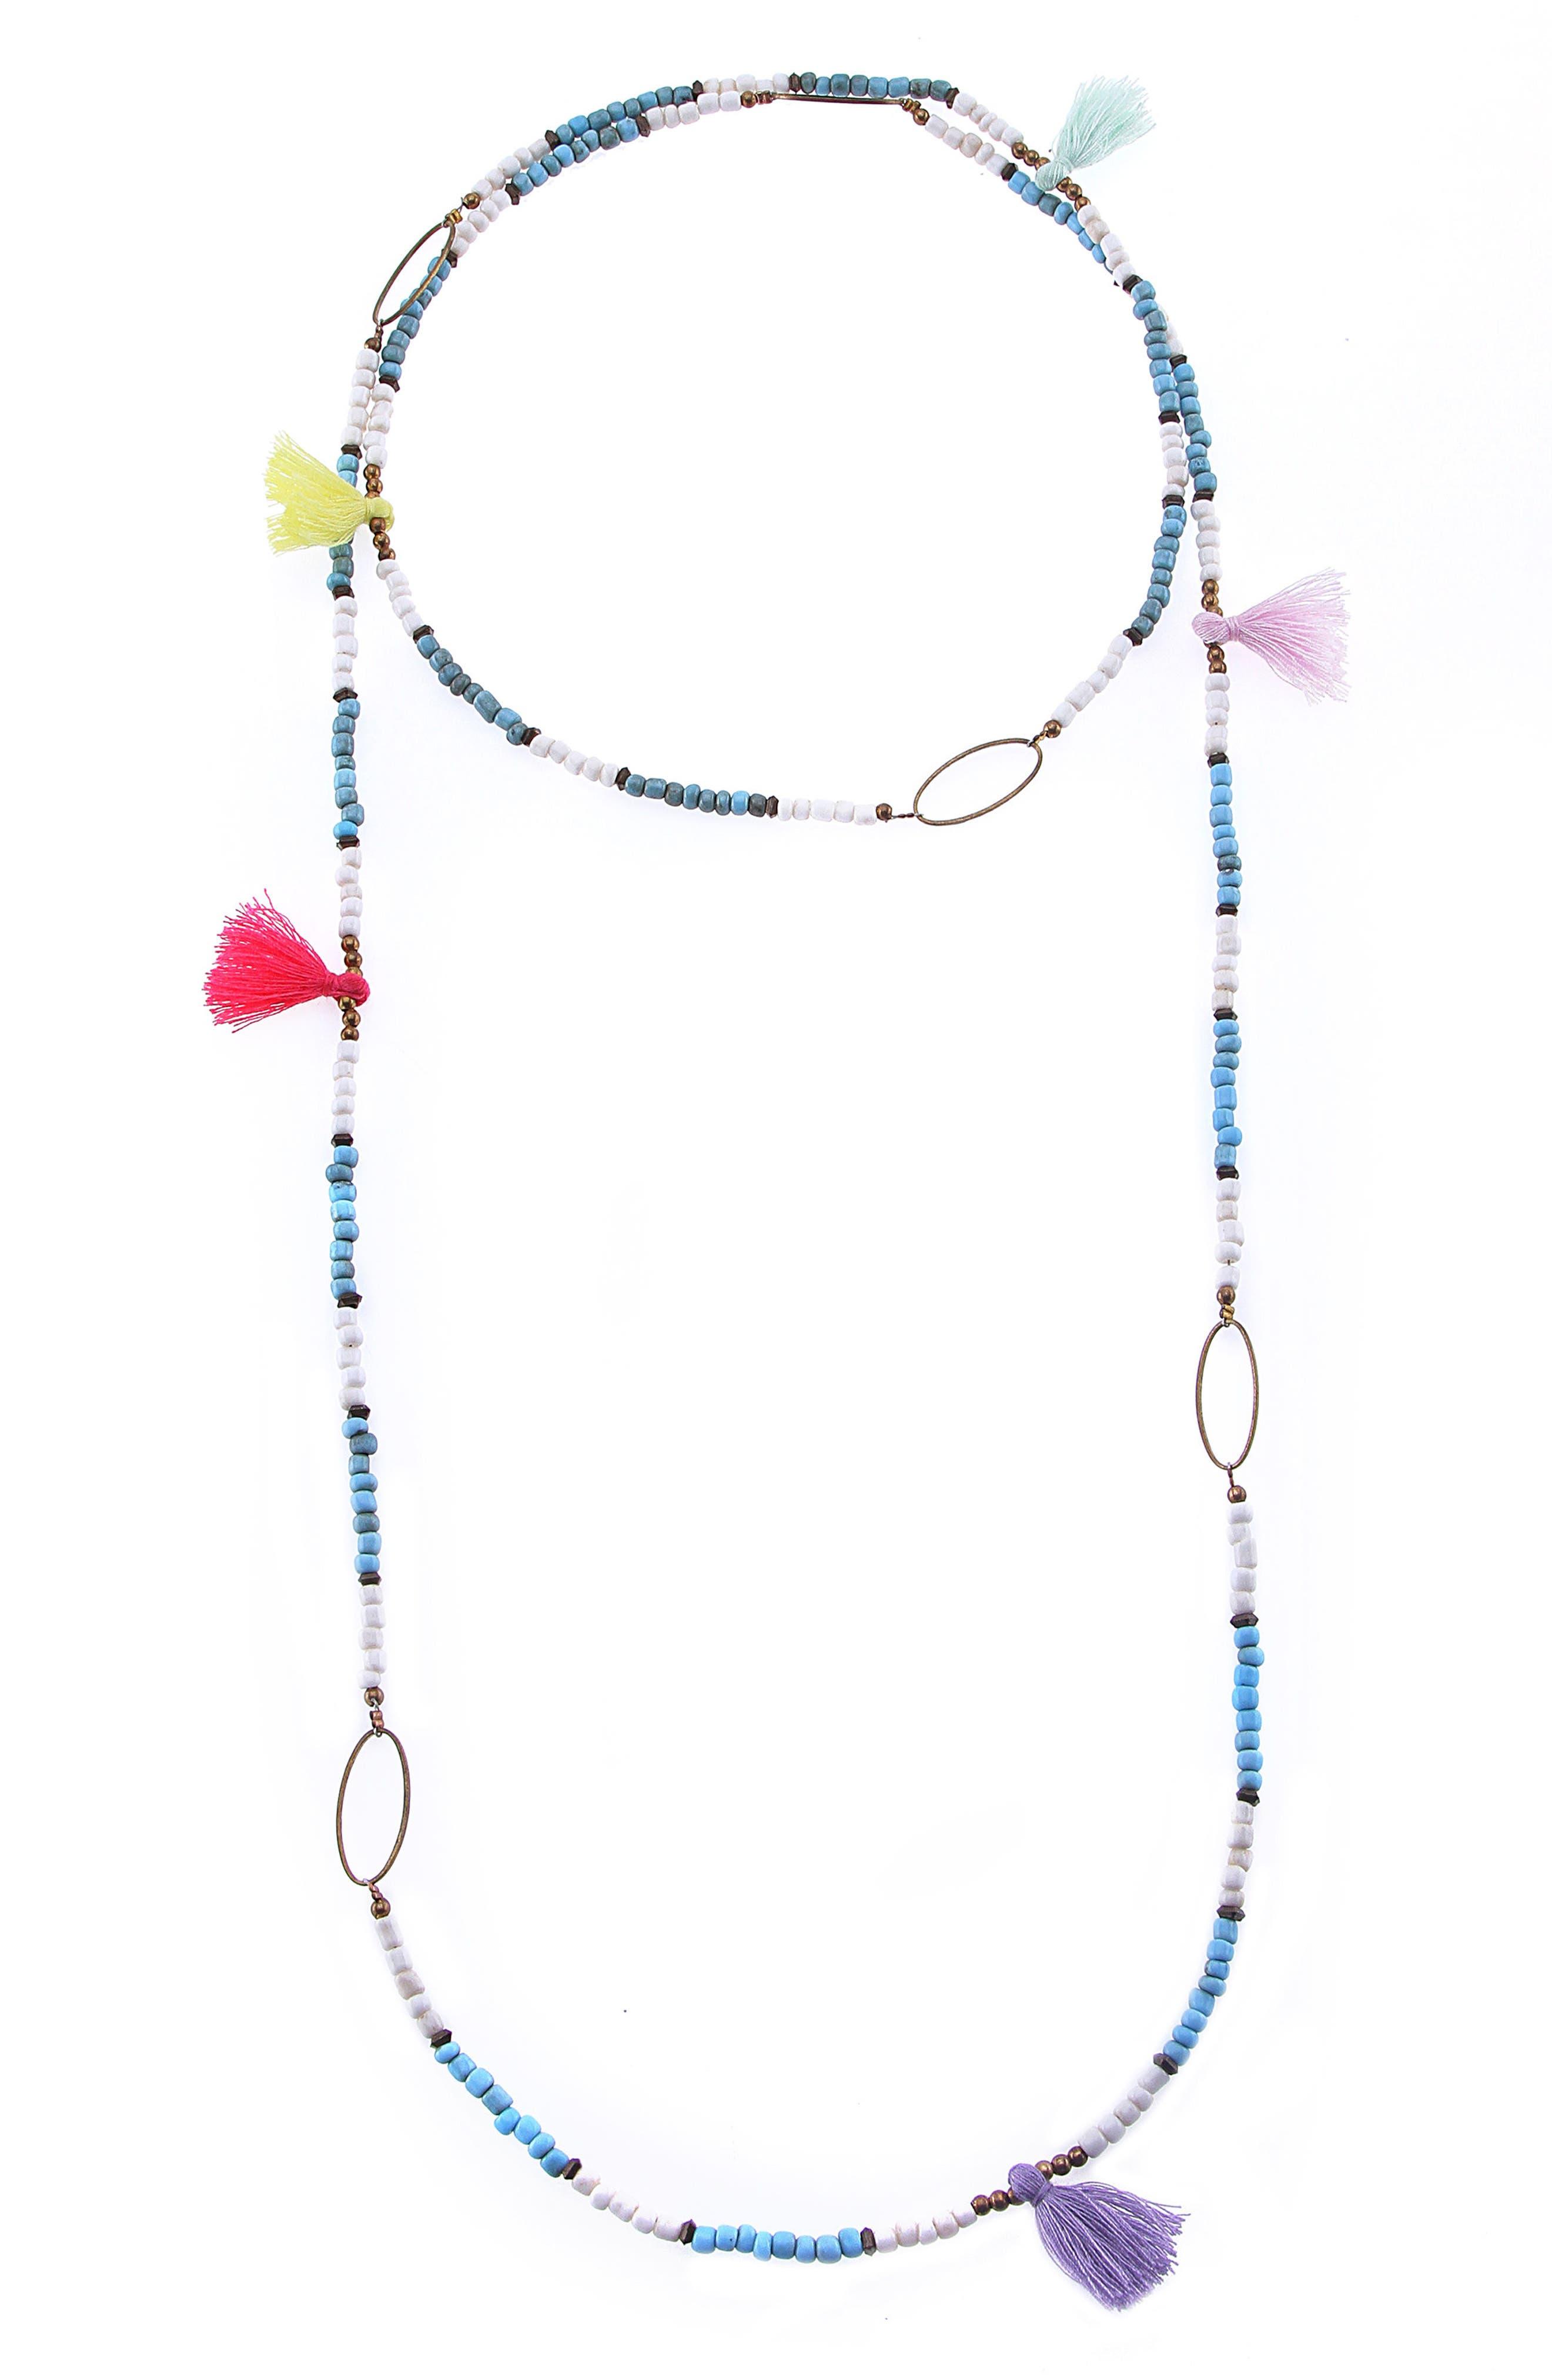 Long Beaded Tassel Necklace,                             Main thumbnail 1, color,                             Blue/ White